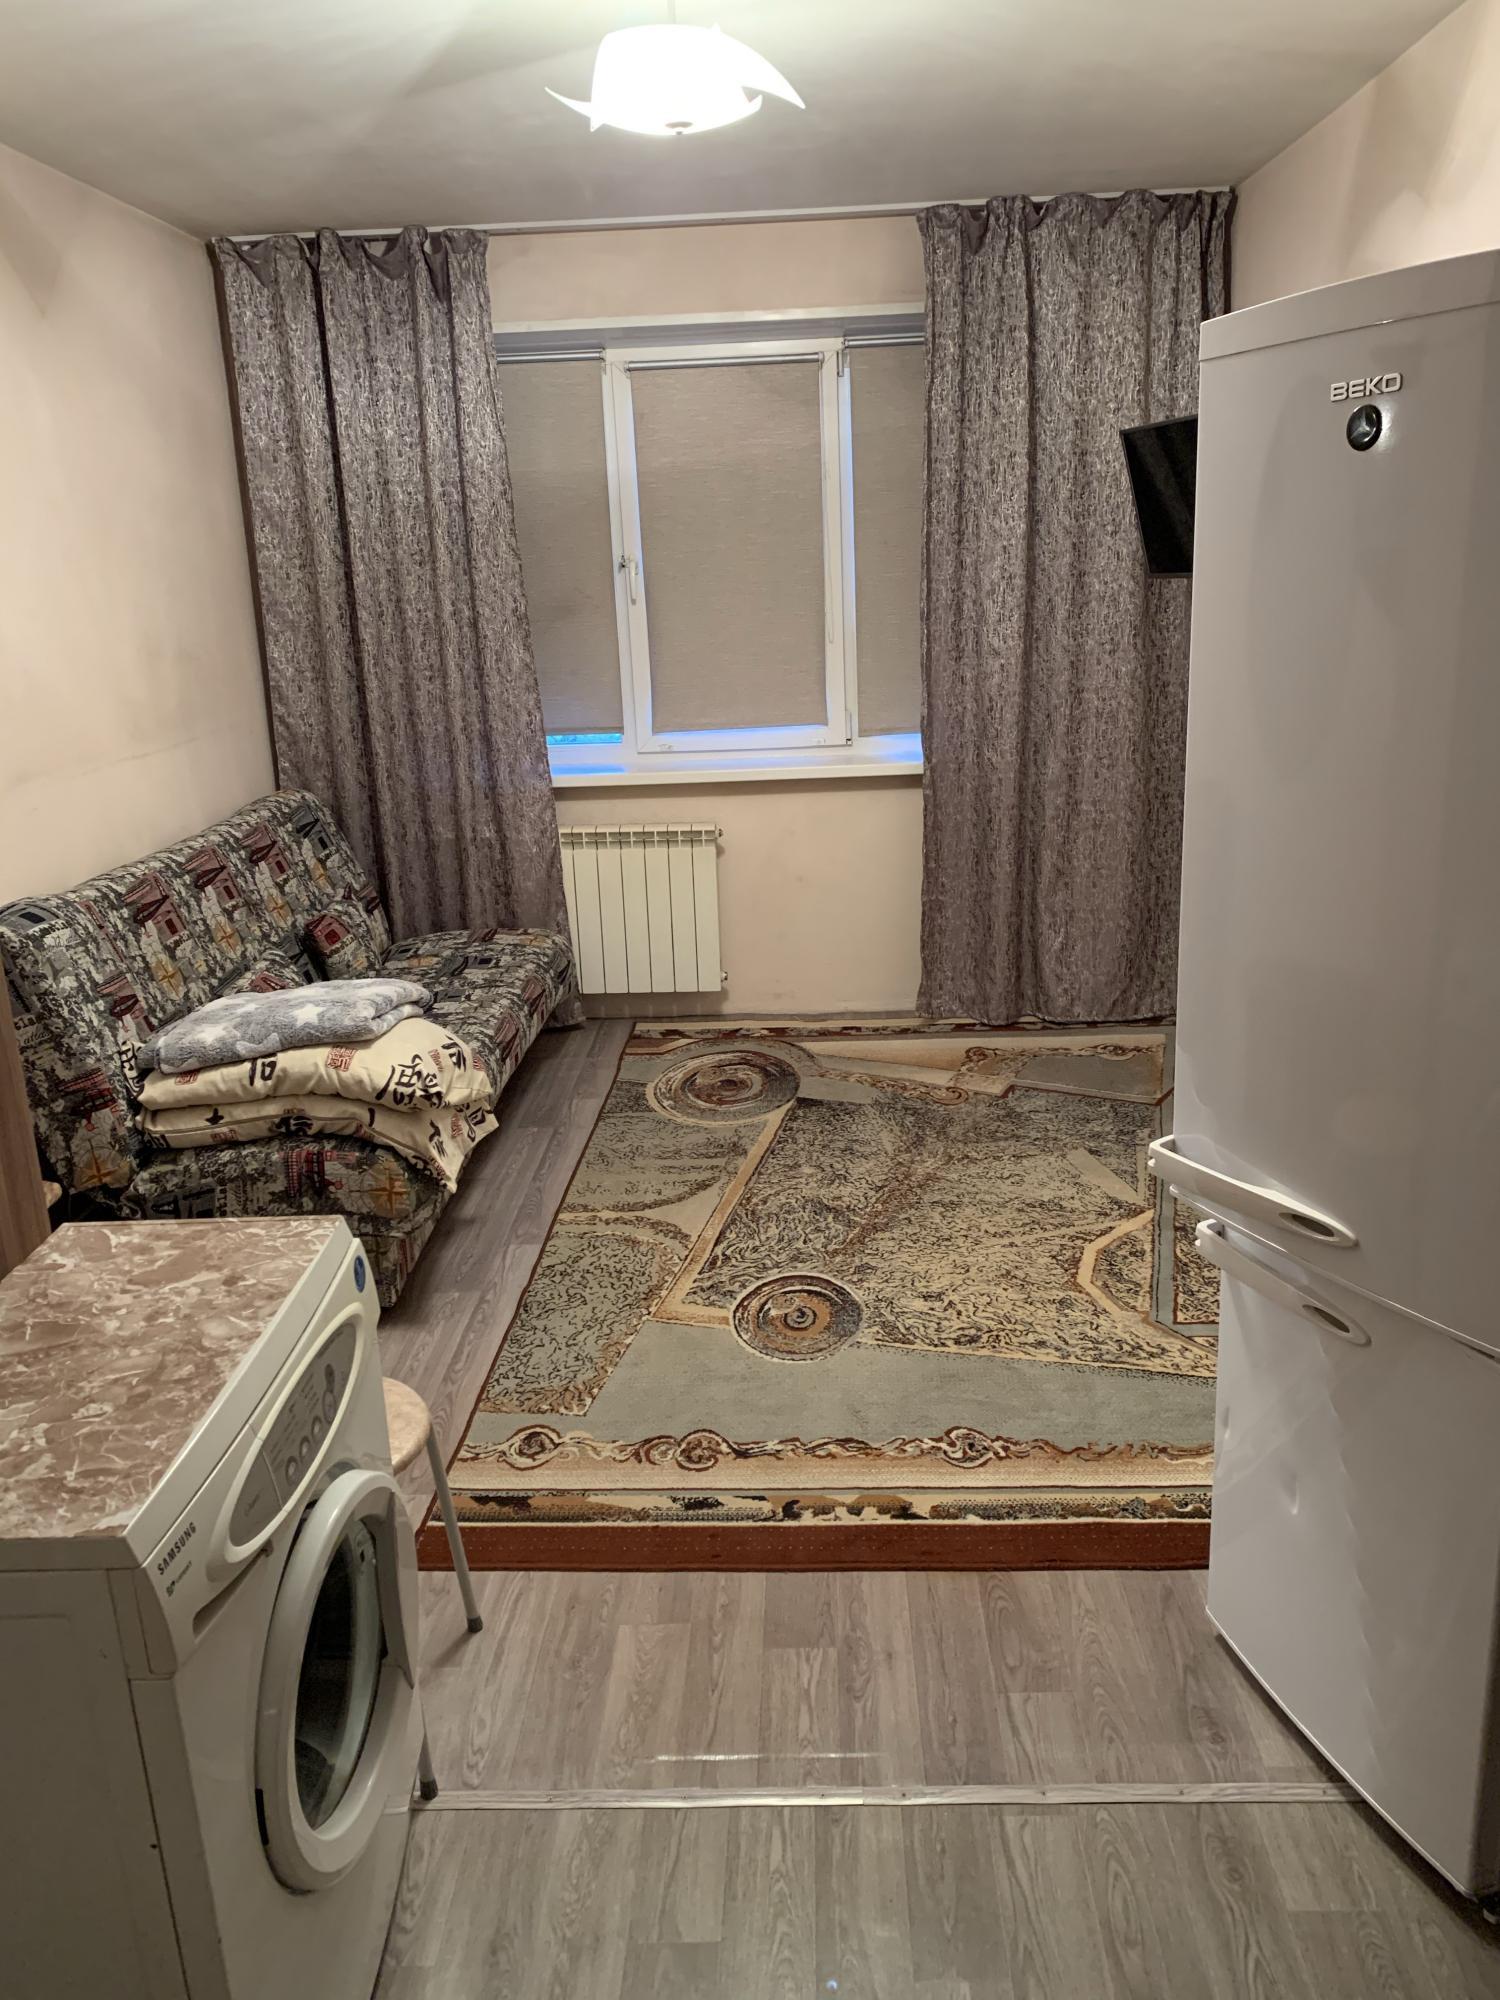 1к квартира Семафорная улица | 12000 | аренда в Красноярске фото 1